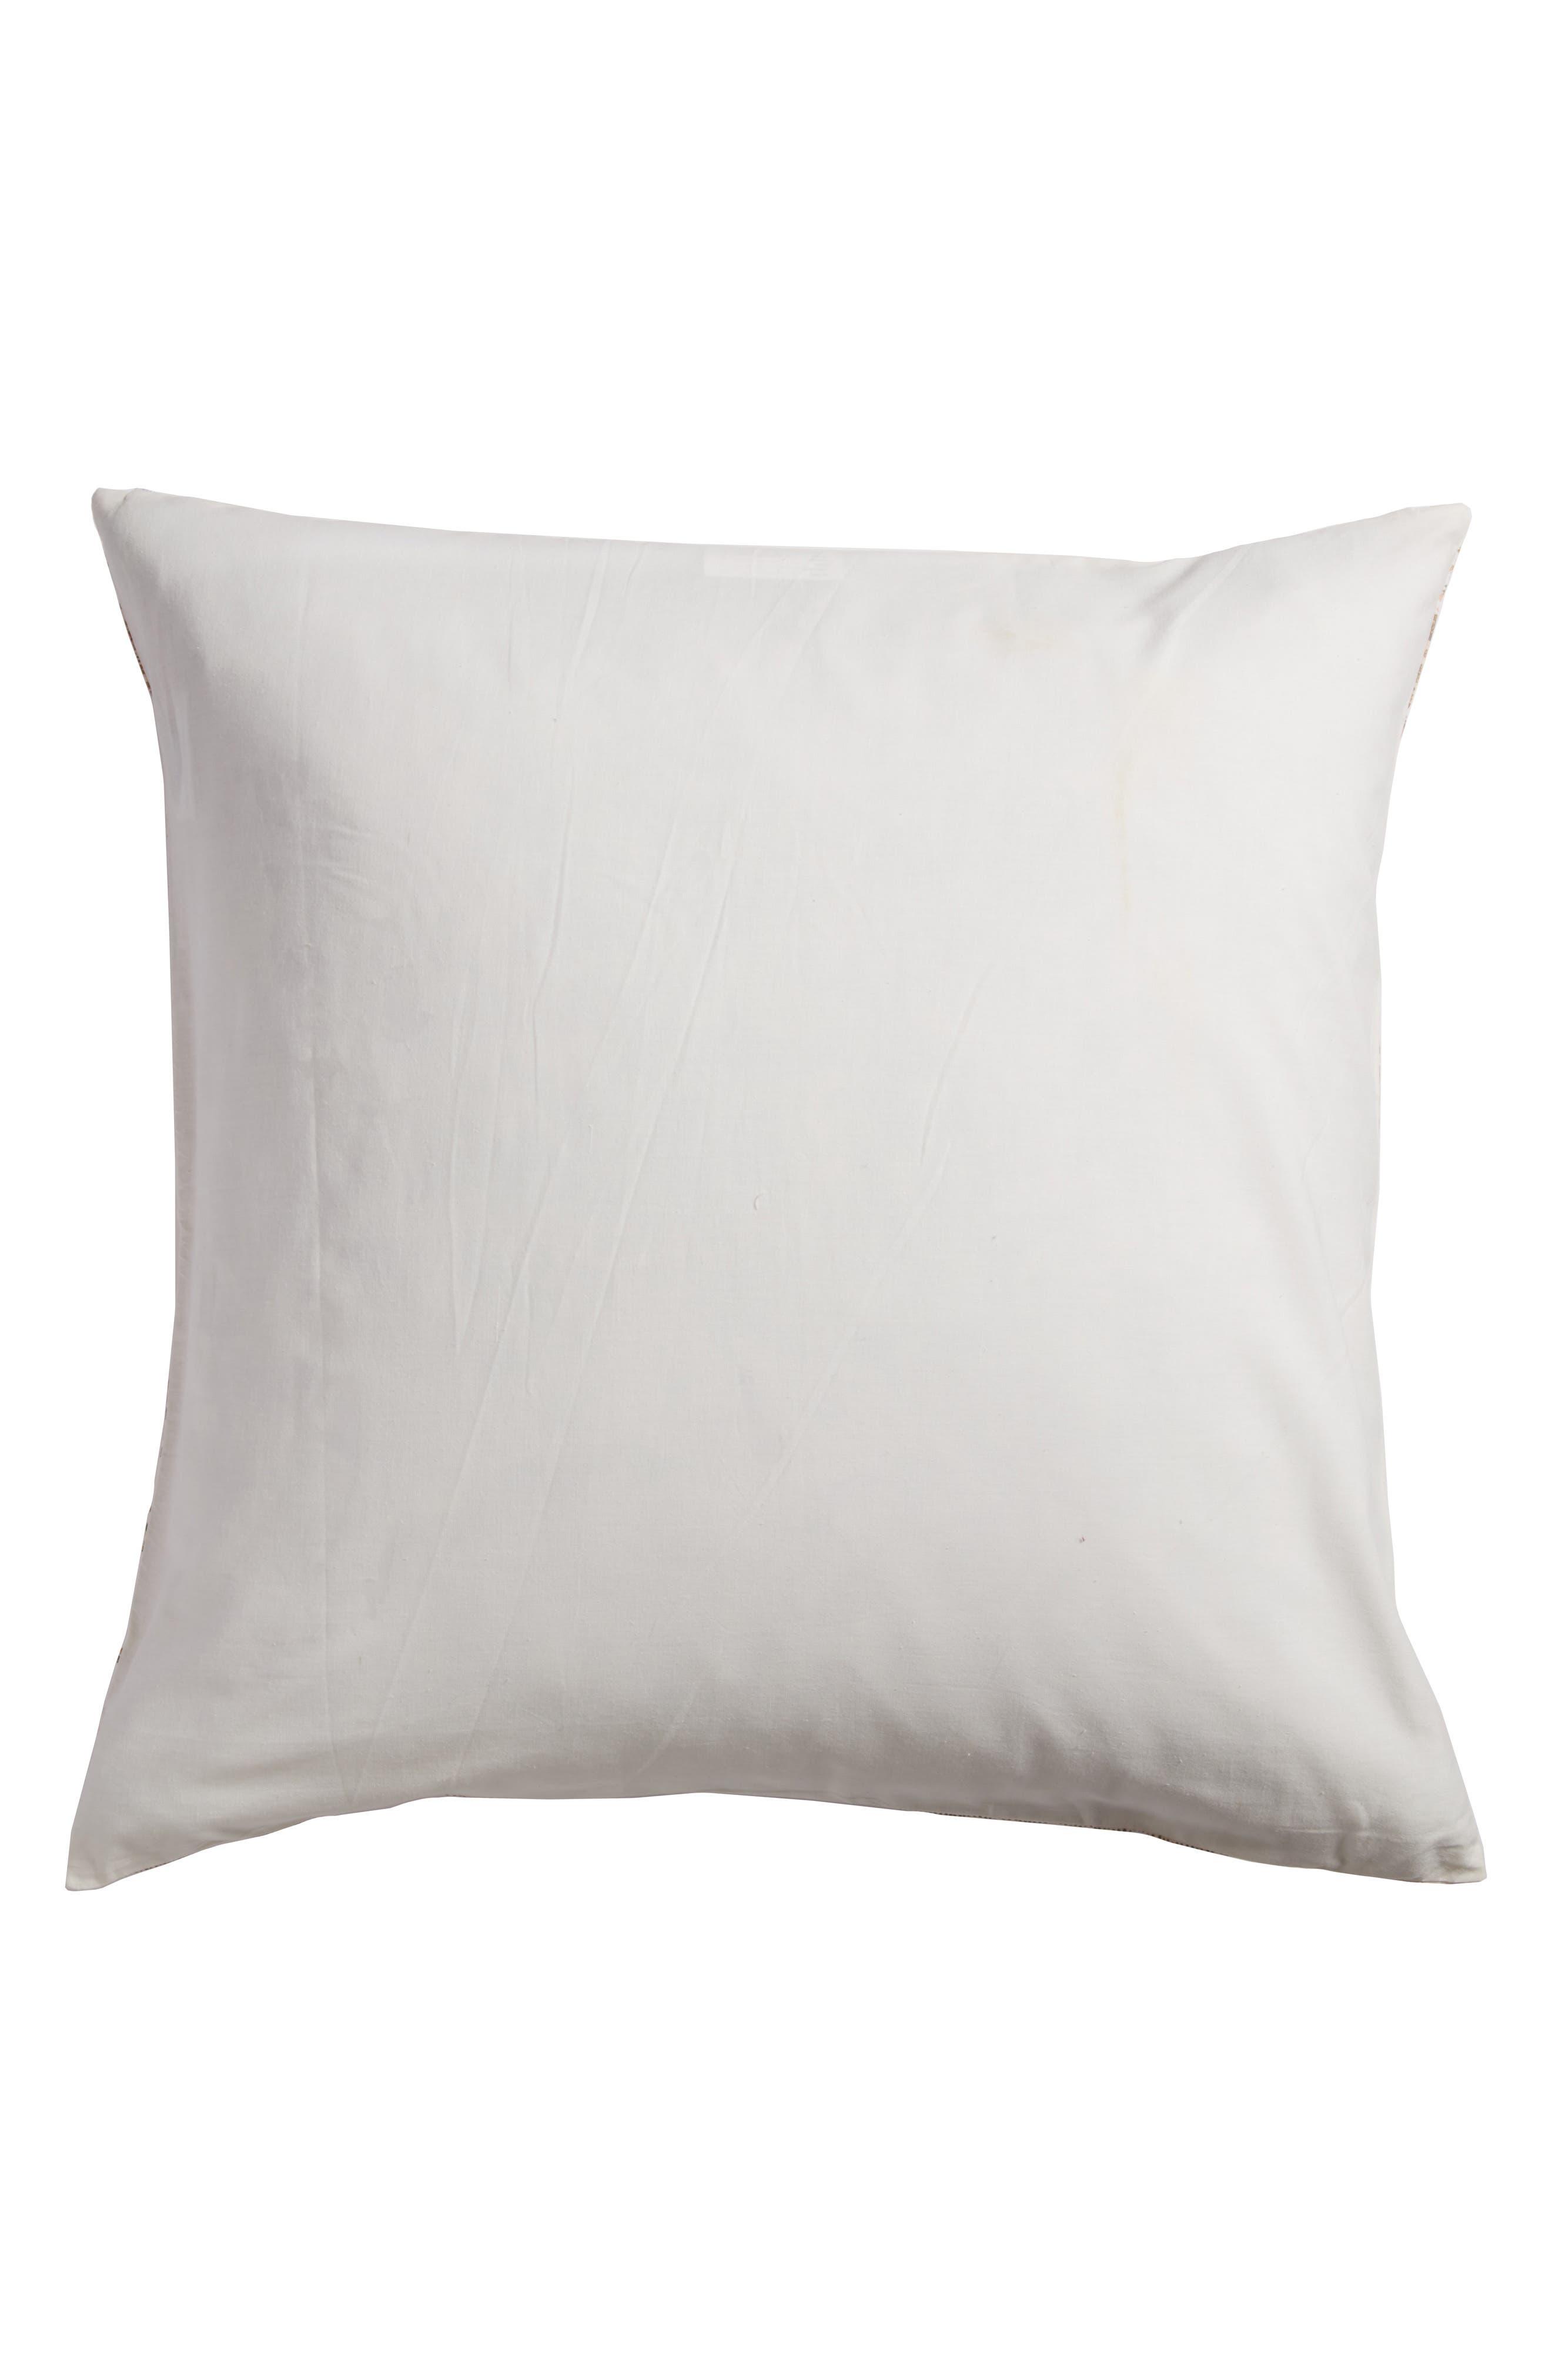 Malia Accent Pillow,                             Alternate thumbnail 2, color,                             900